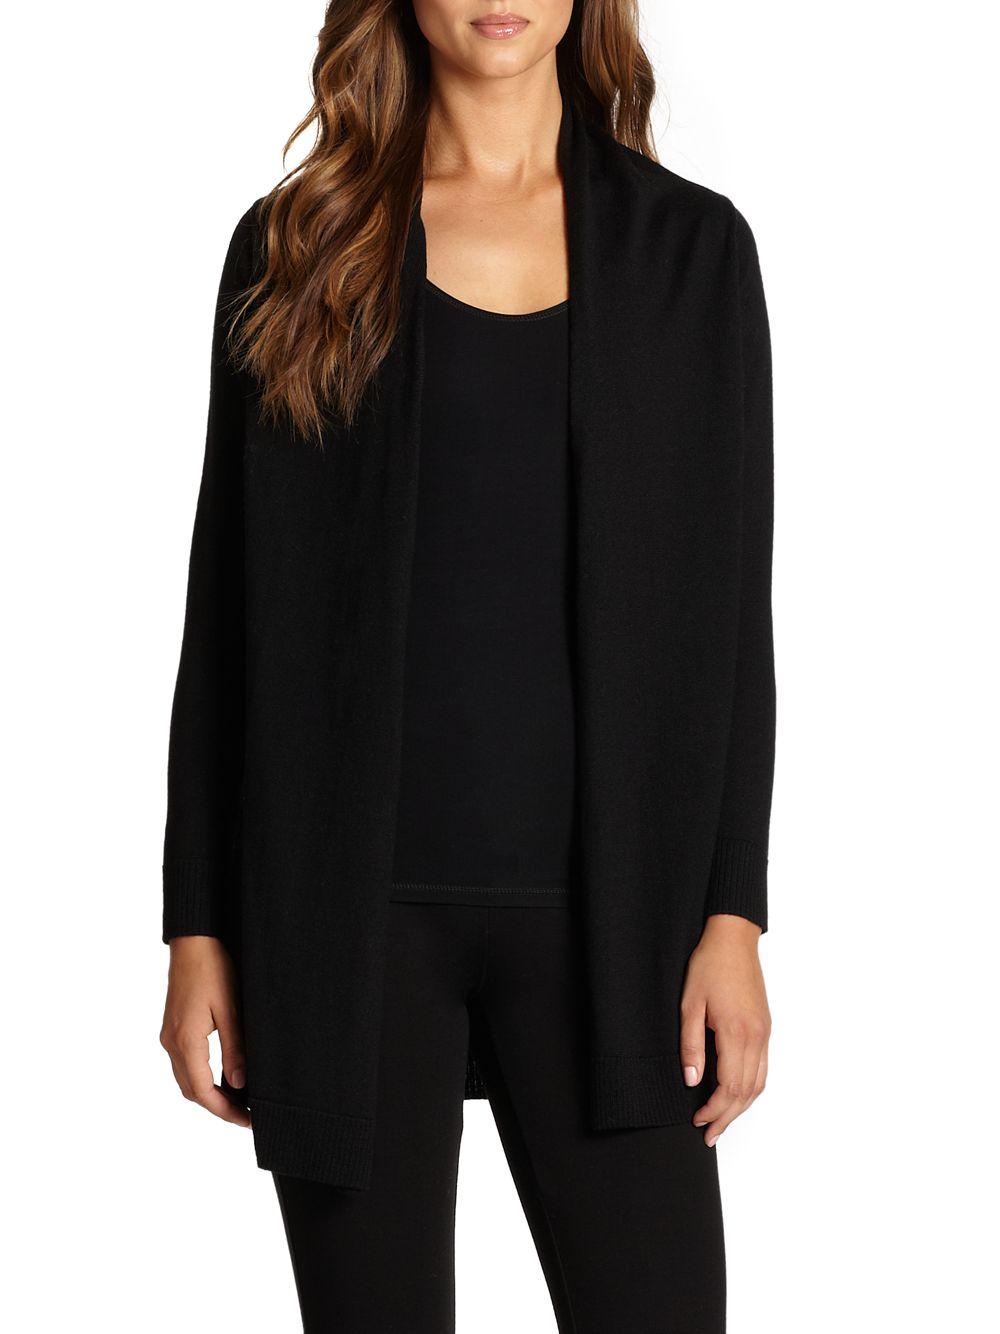 Elie Tahari Adele Shawl-Collar Merino & Silk Cardigan Sweater Details Elie Tahari